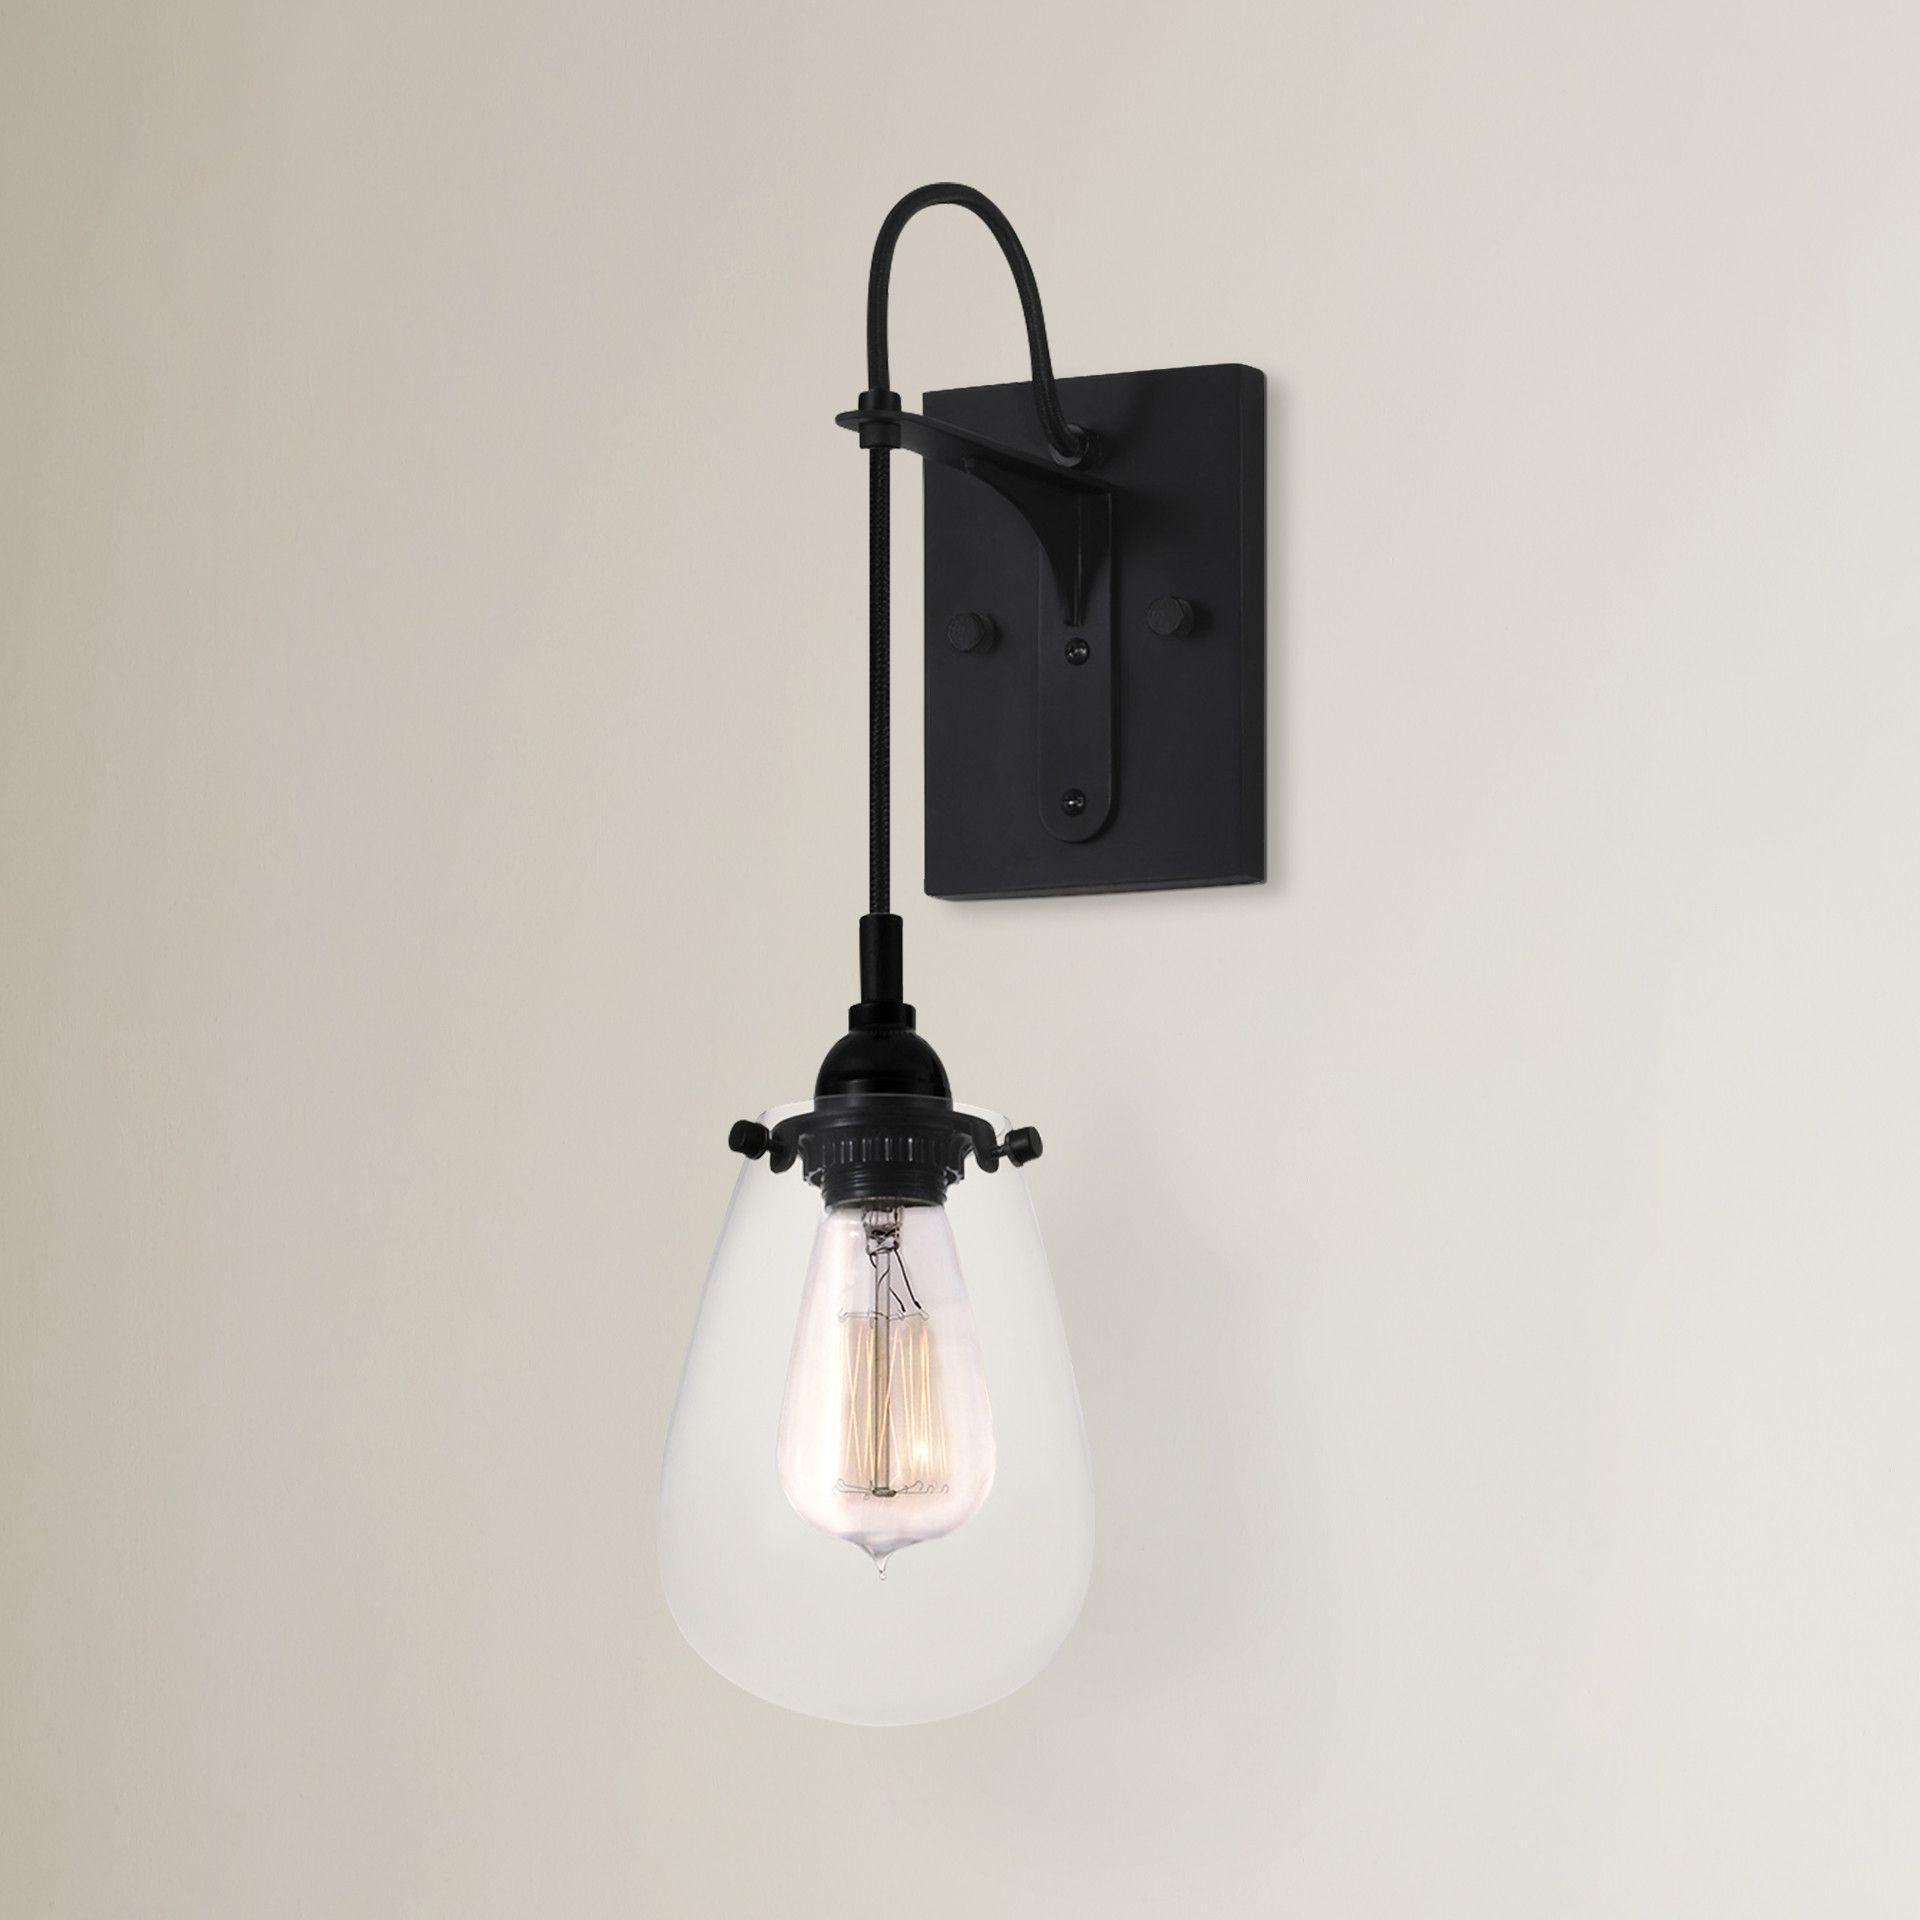 Trent austin design lamson light wall sconce lighting kitchen